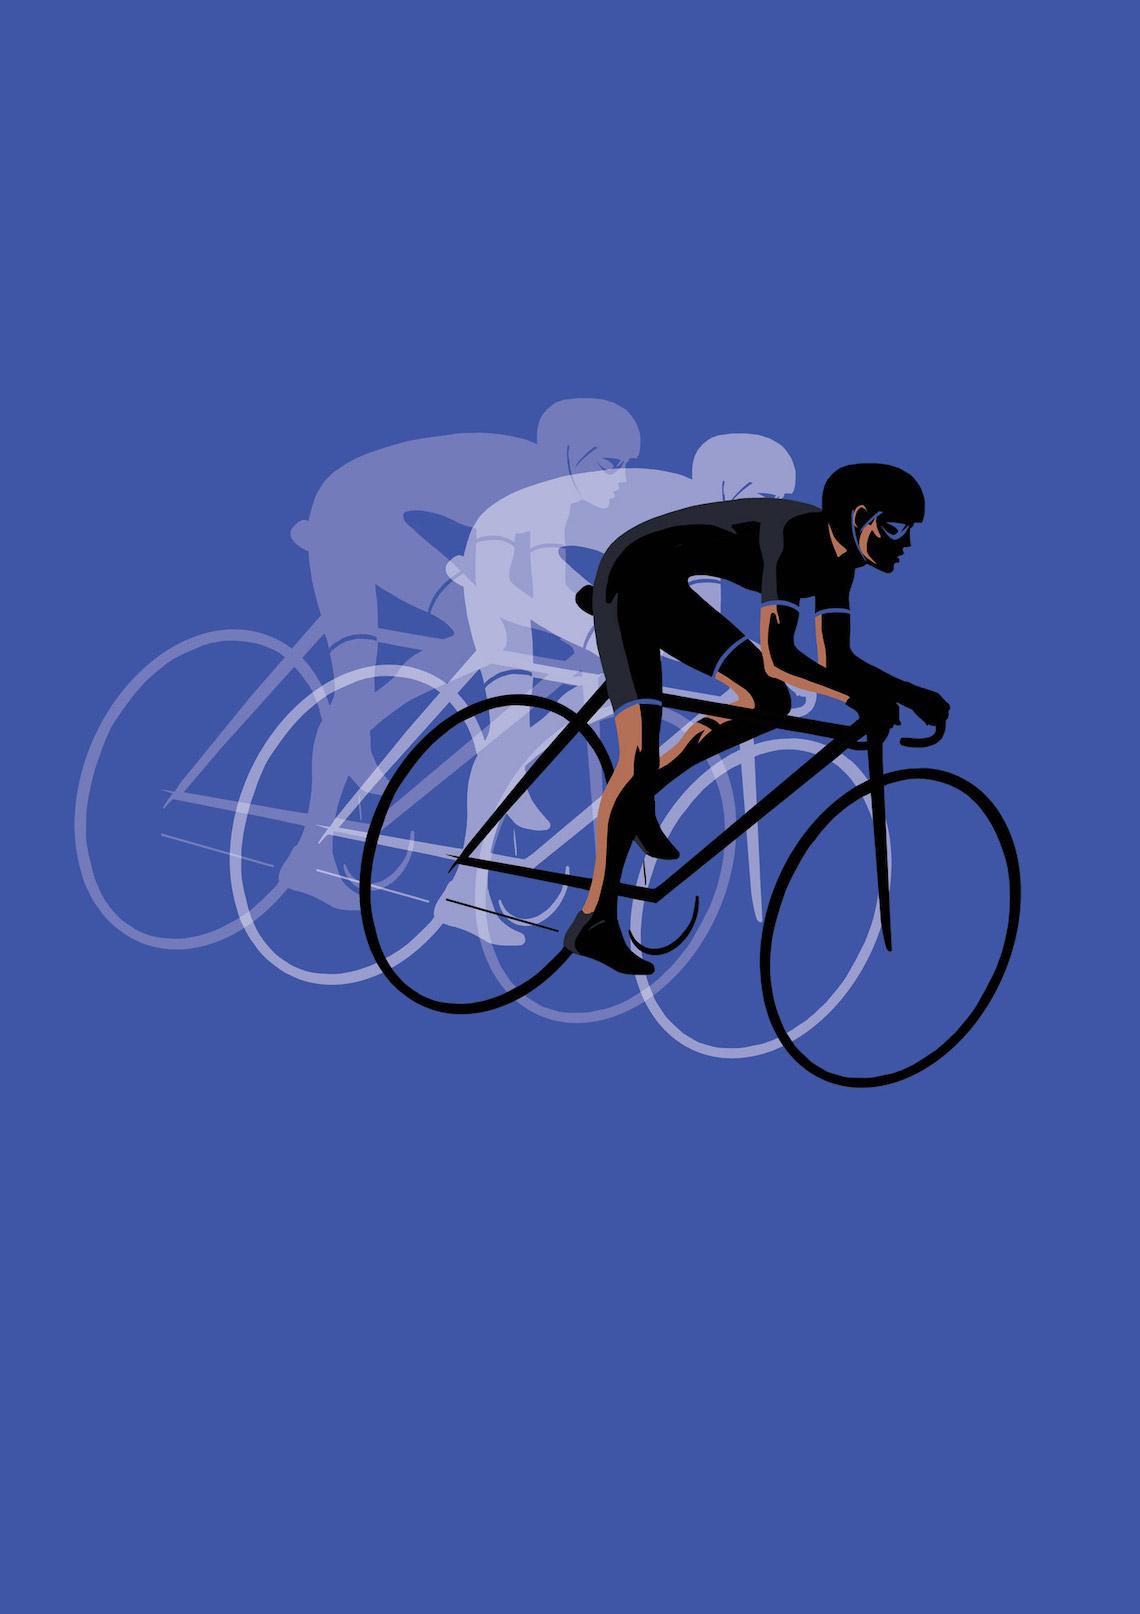 Jason Brooks ciilustrazioni sul ciclismo_4